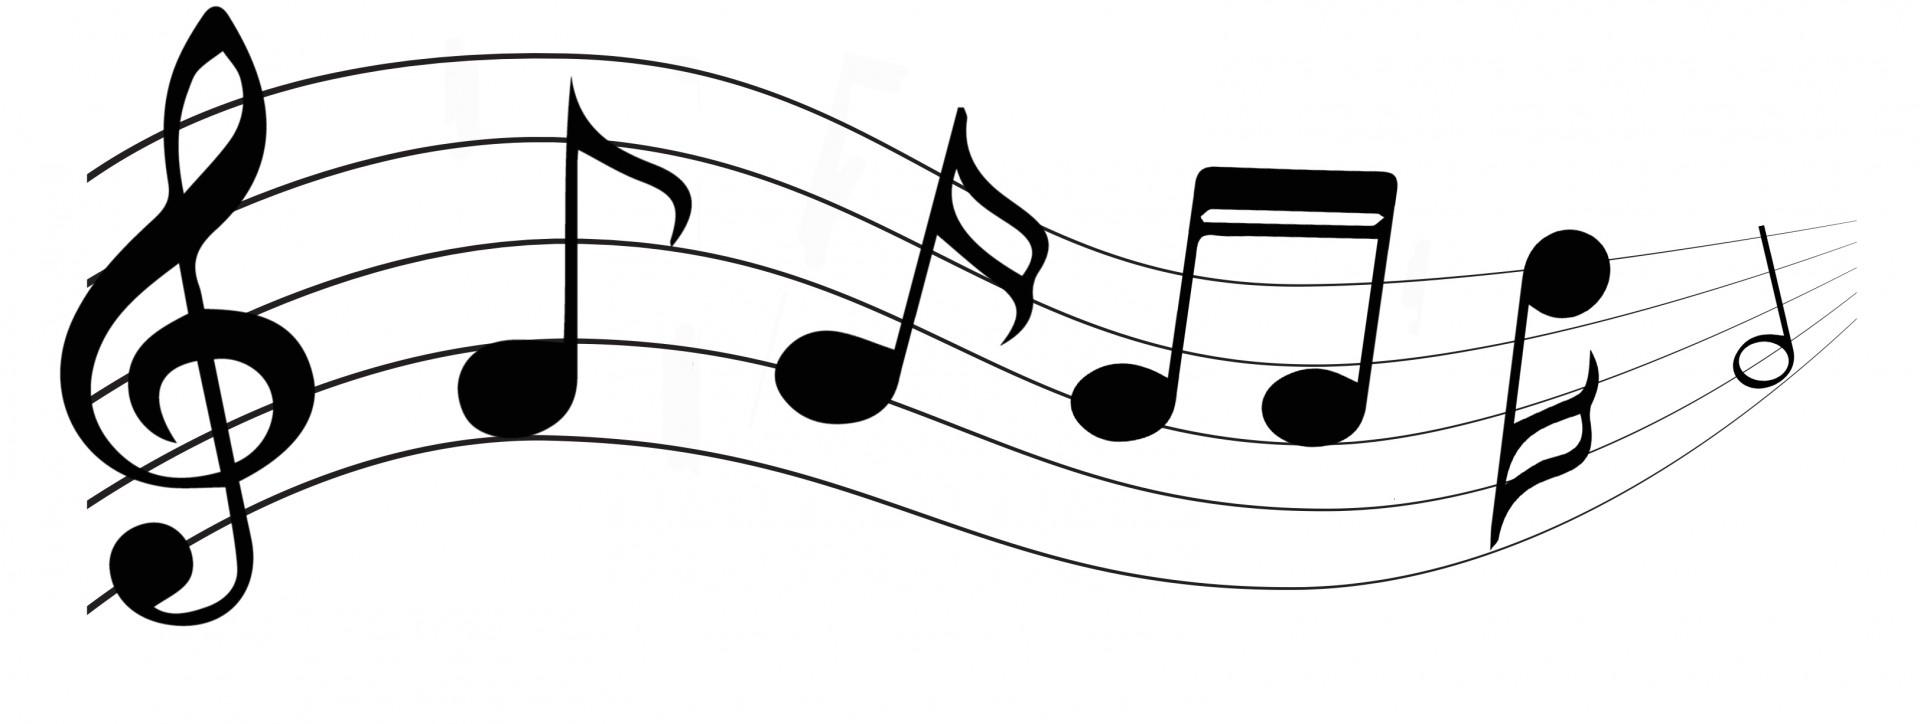 musical-notes.jpeg